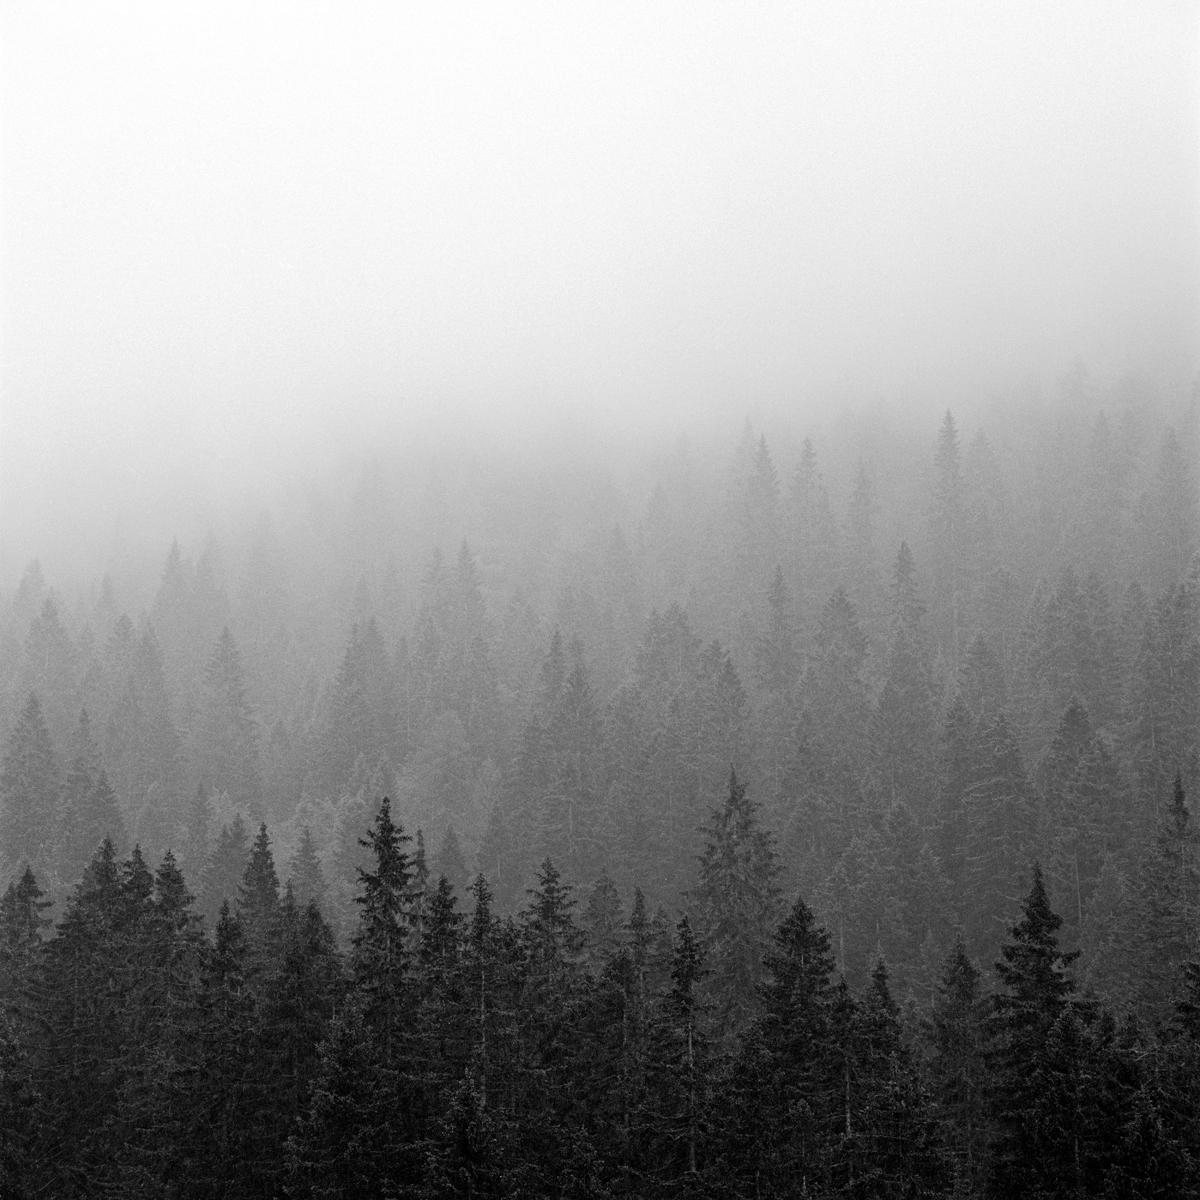 012 | Hasselblad 501C | ©AlbertoBregani